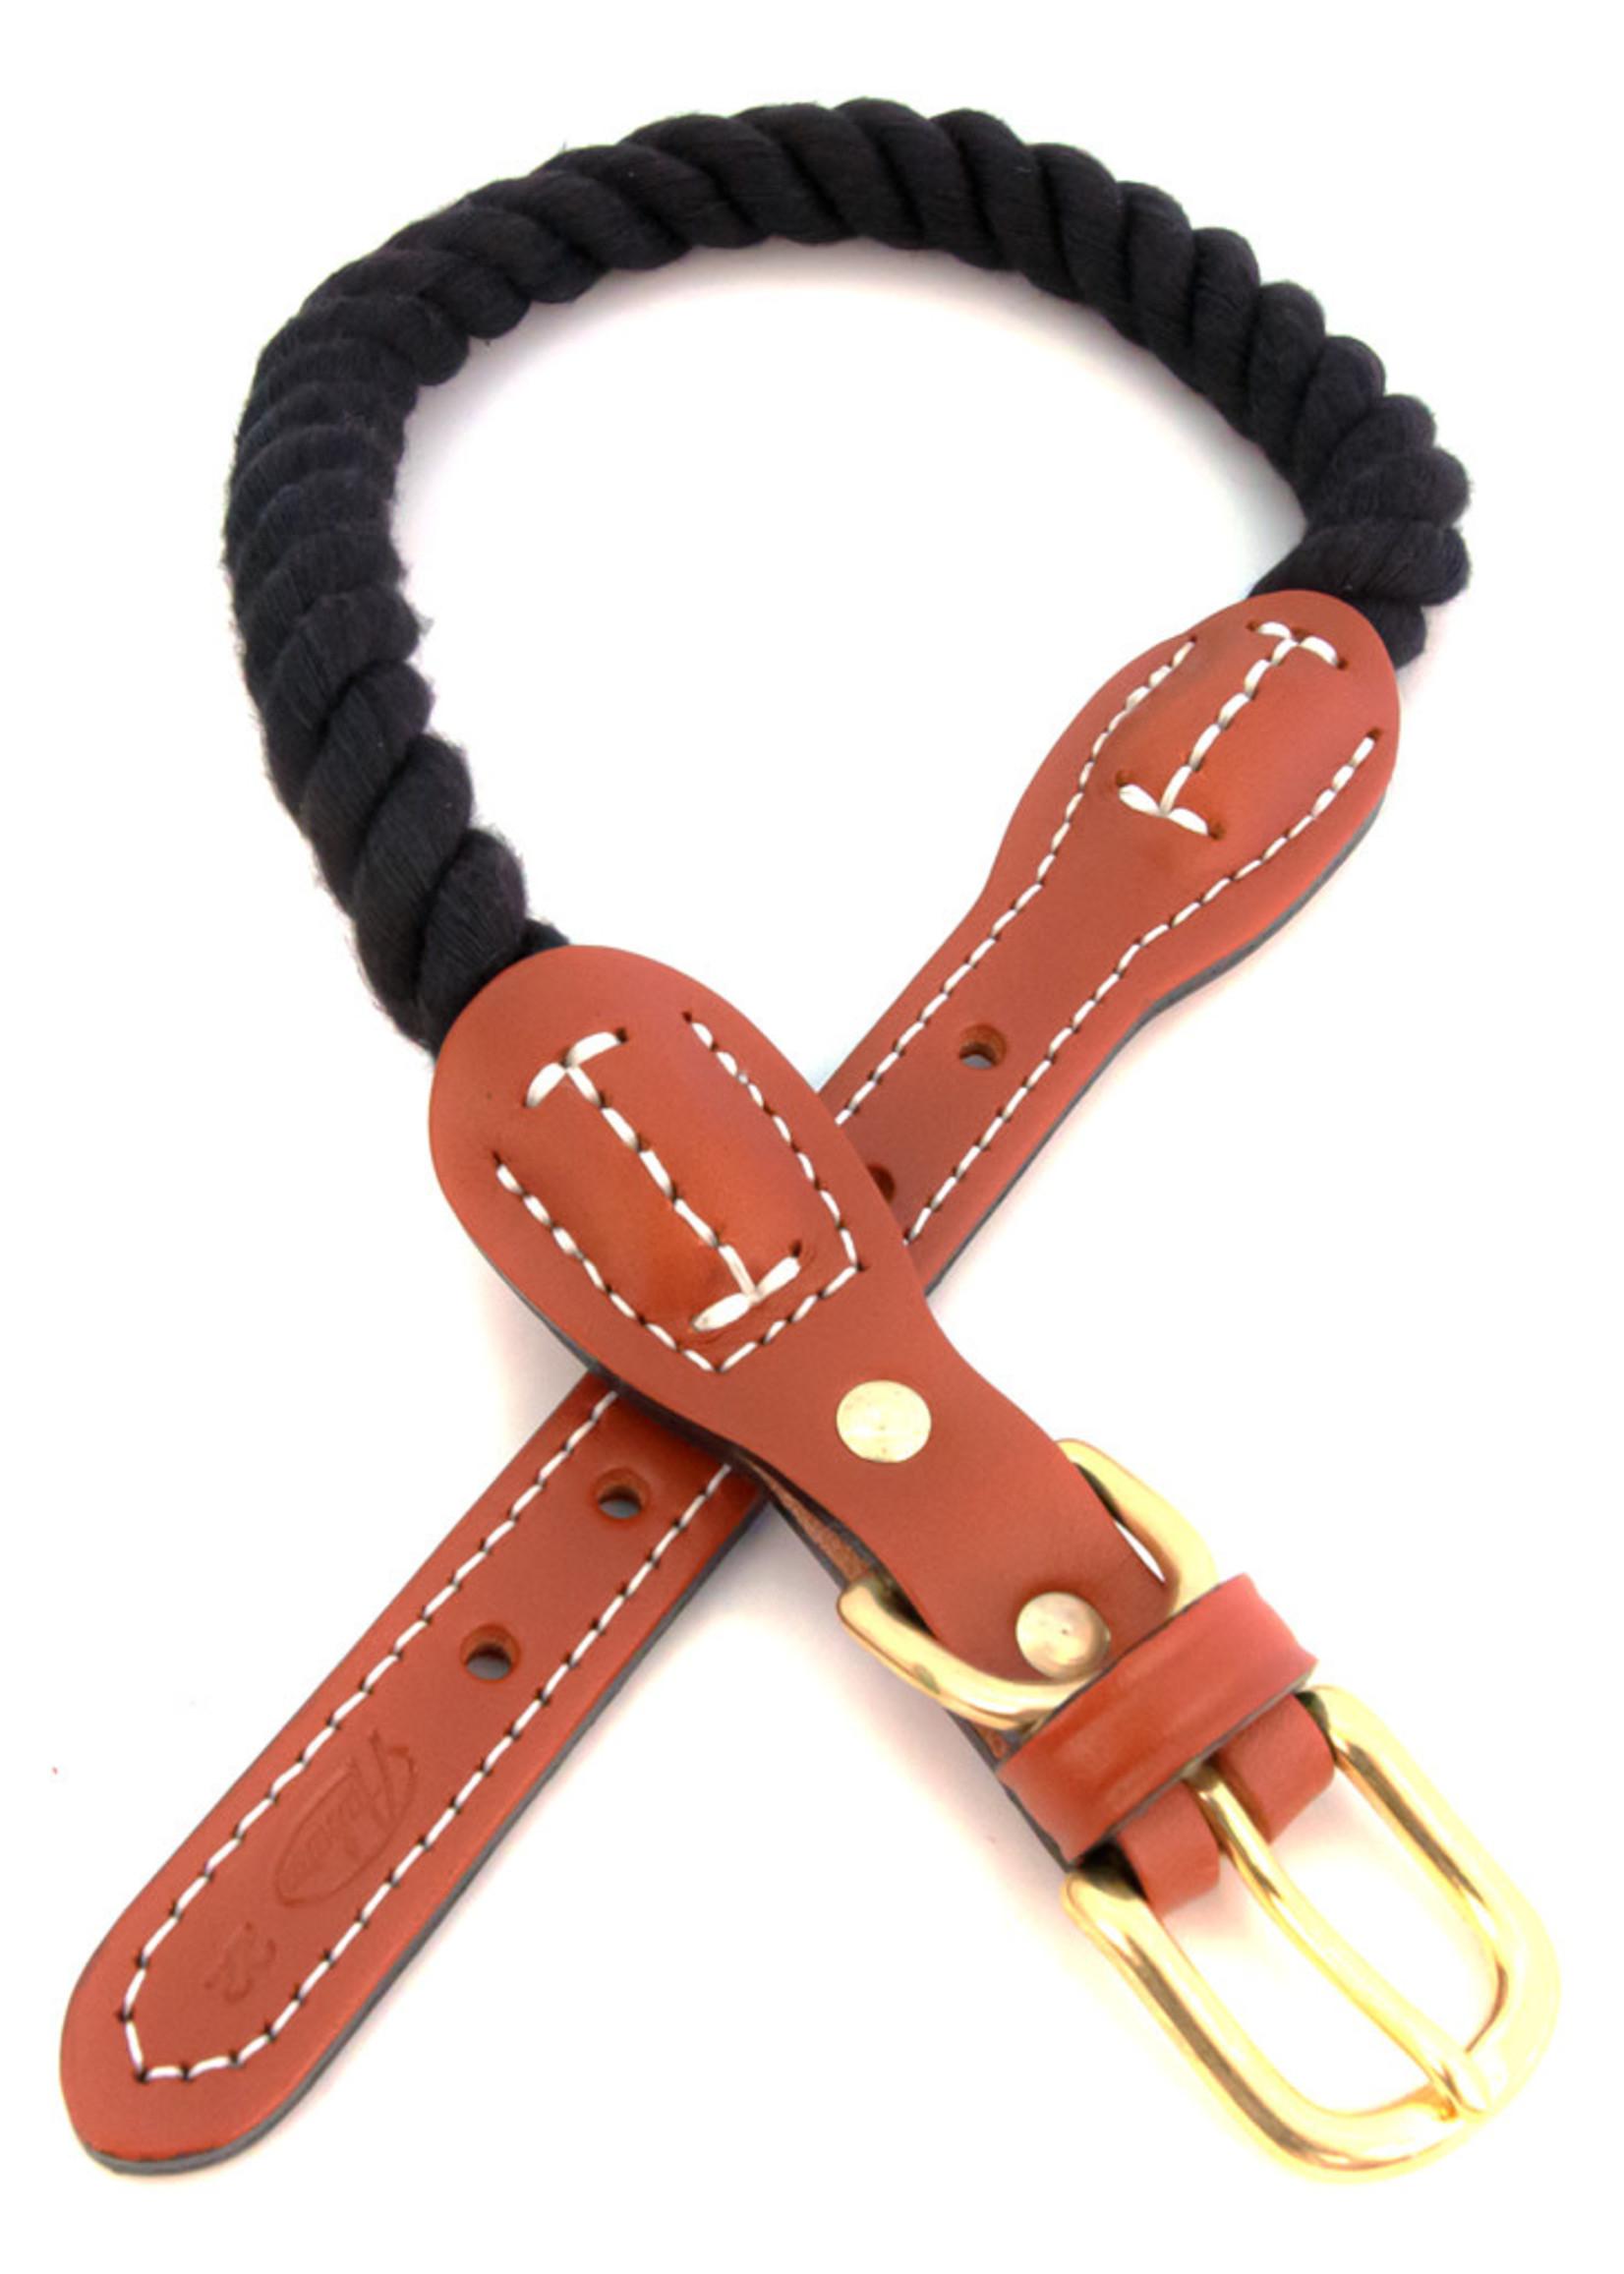 "Auburn Leathercrafters Auburn Leather Black Cotton/Leather Collar 3/4""x14"""